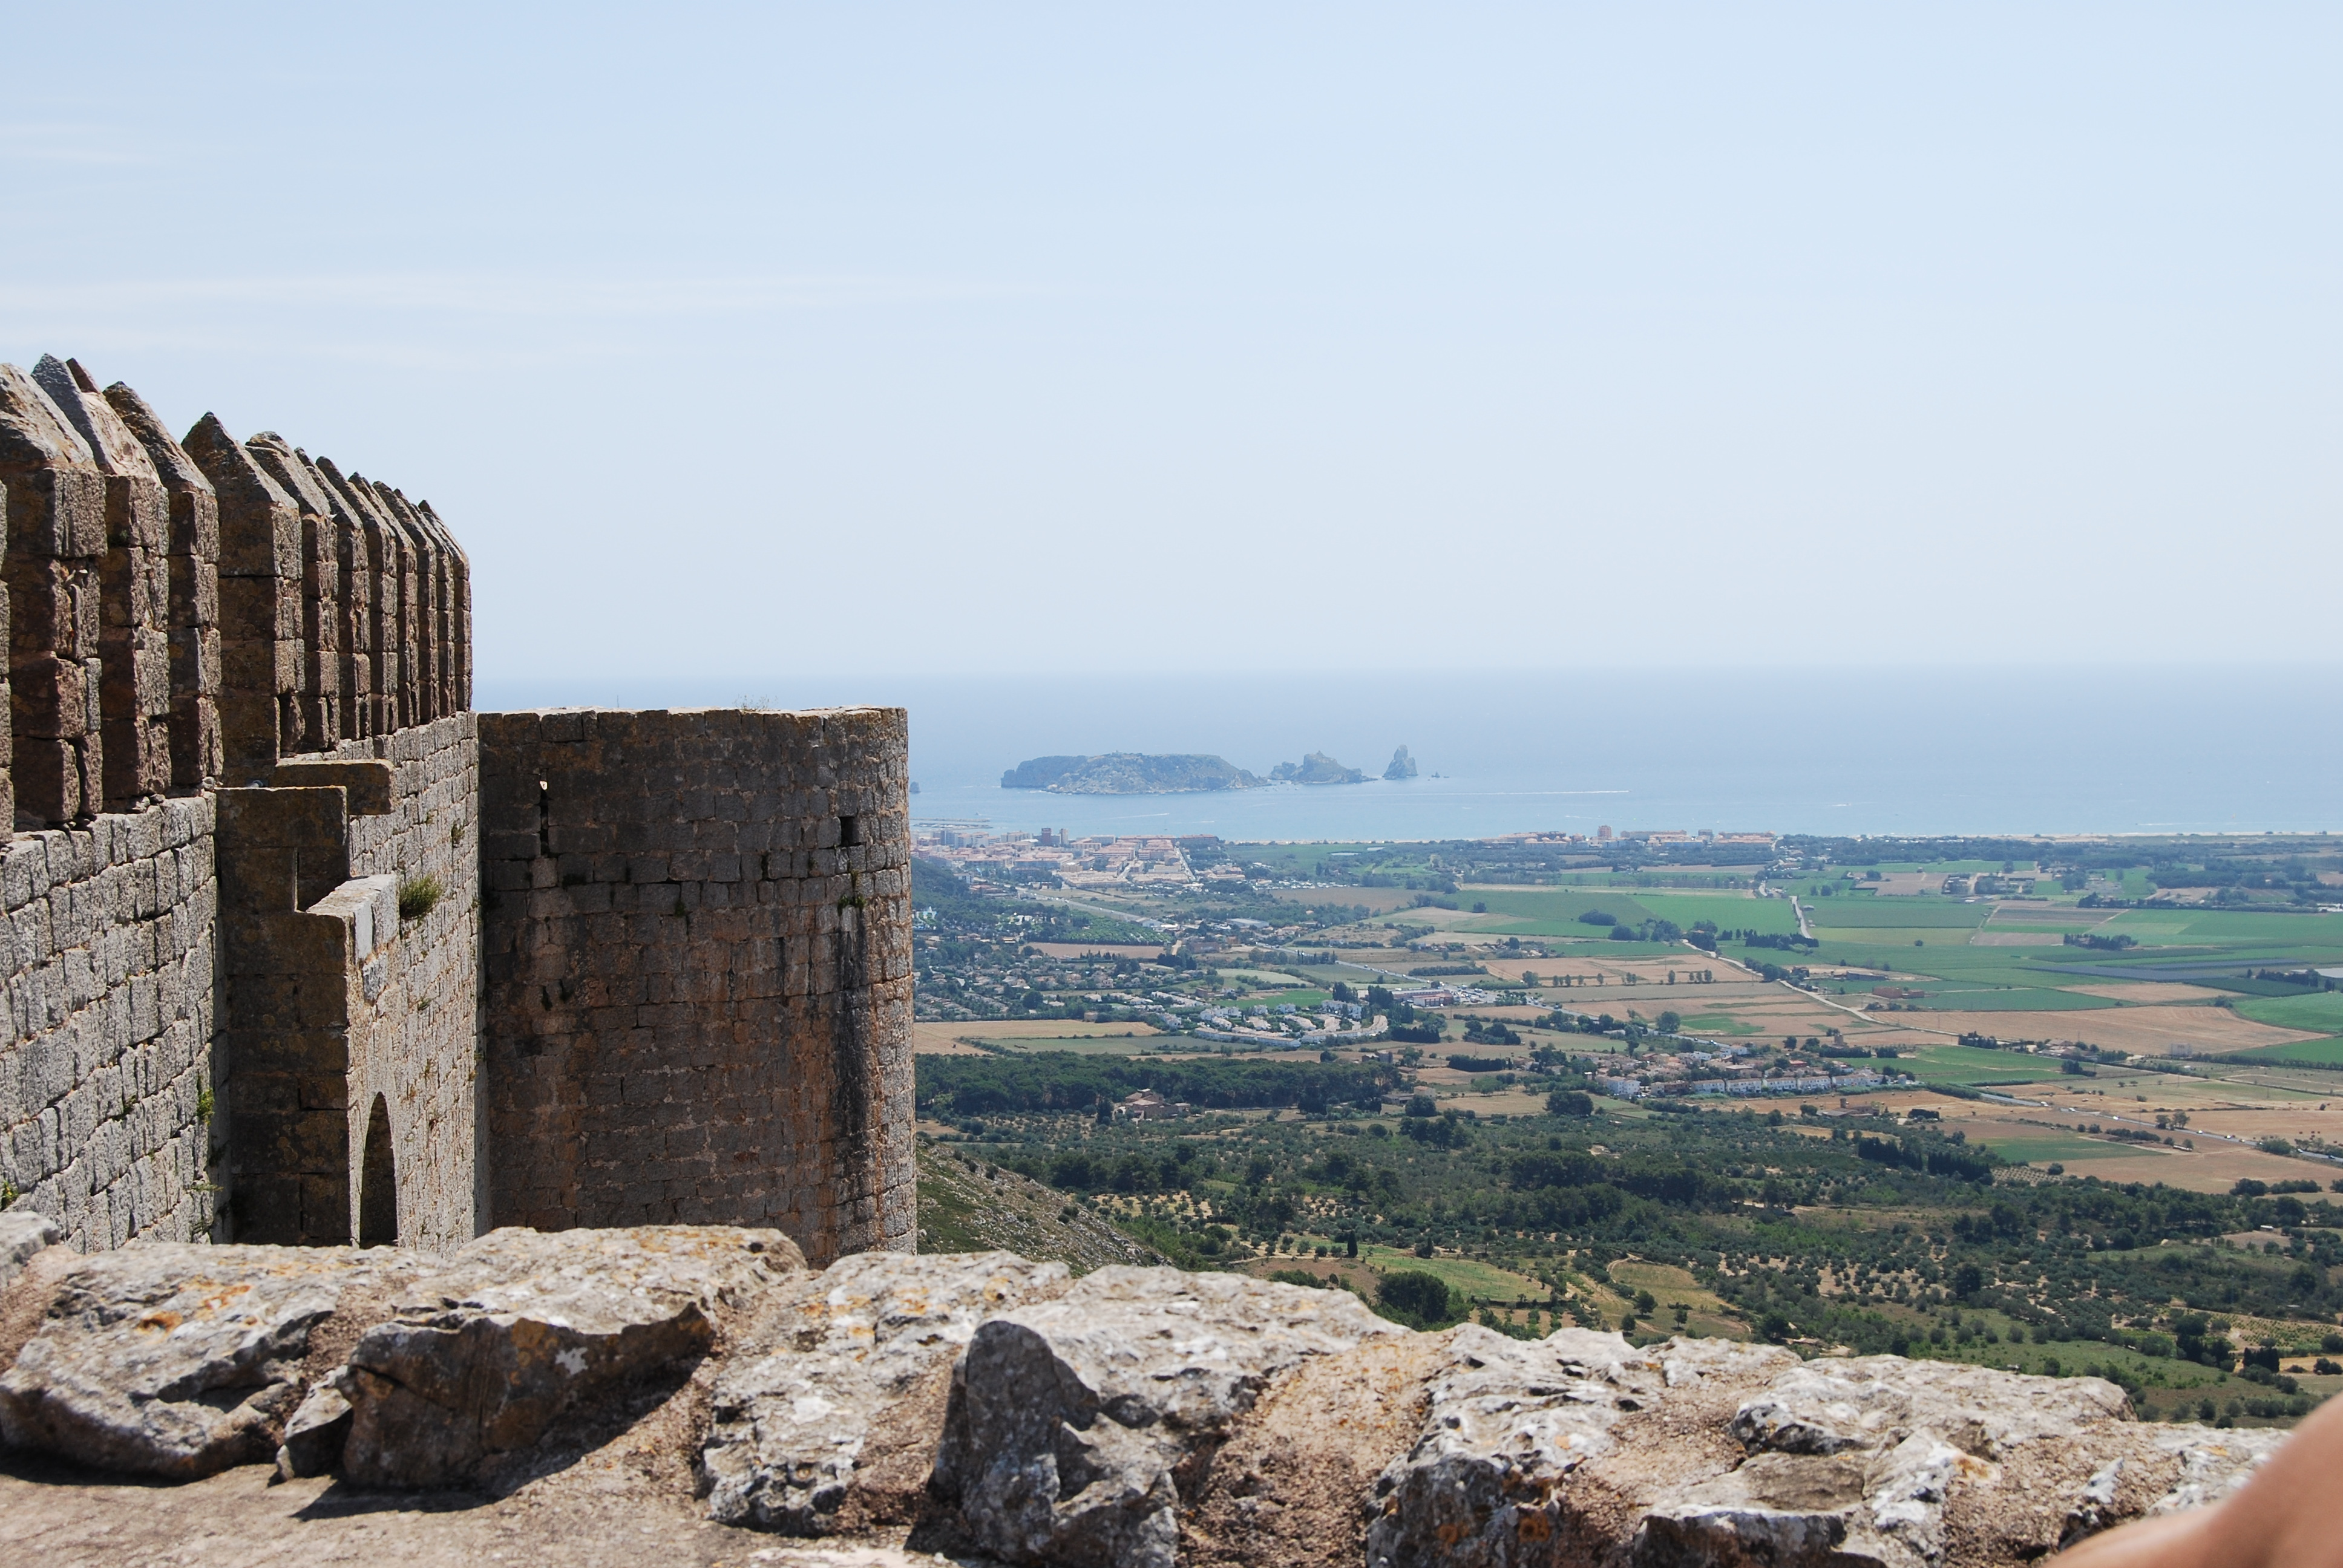 Torroella de Montgri Spain  City pictures : Description Castell de Torroella de Montgri, vista desde el castell ...